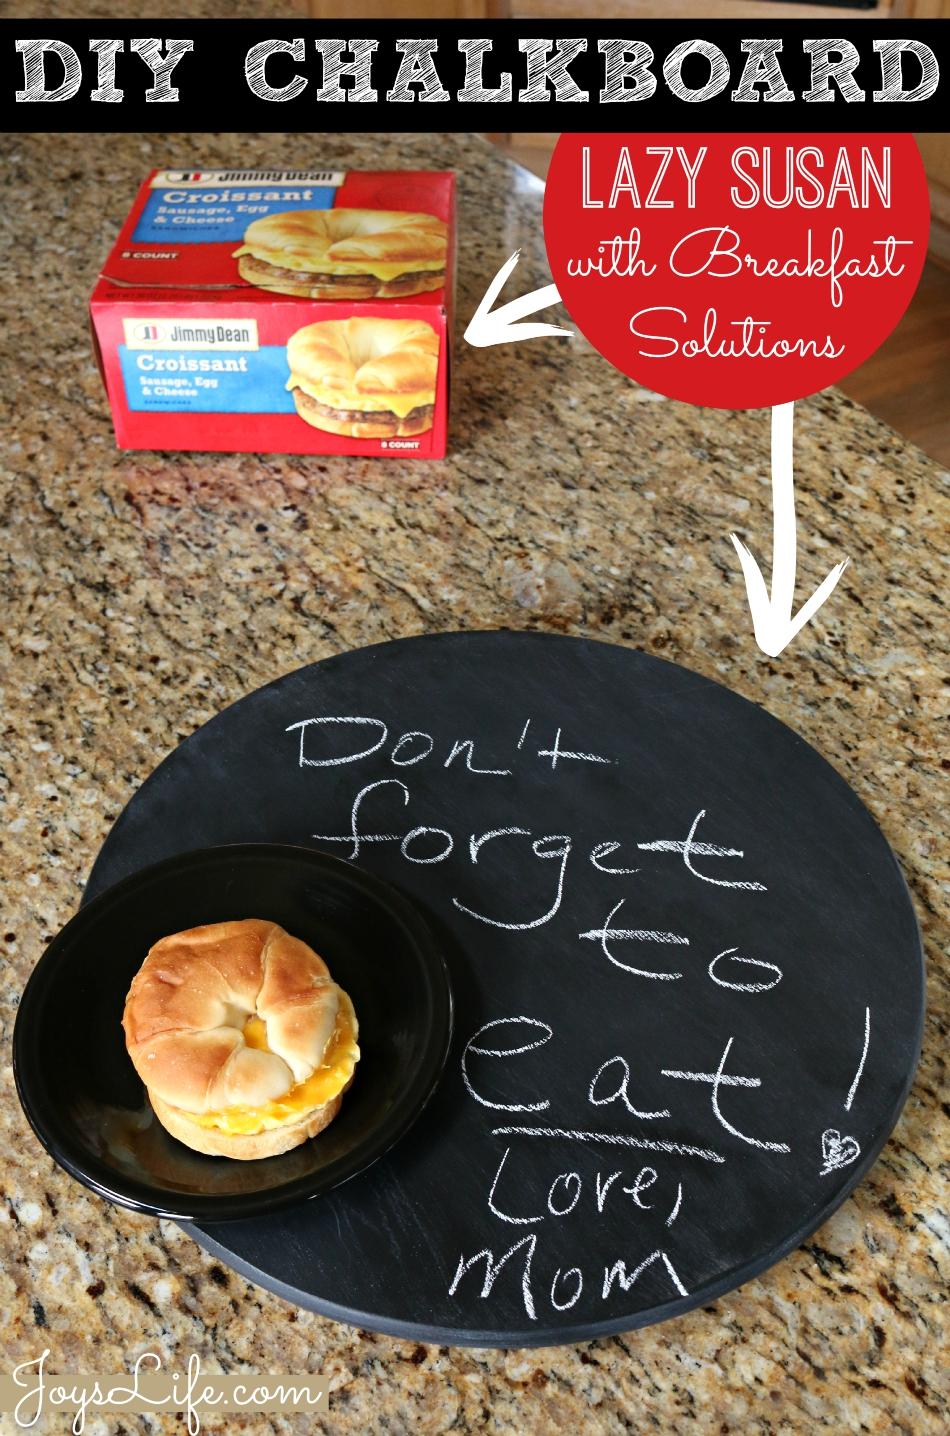 DIY Chalkboard Lazy Susan #FuelForSchool #Ad